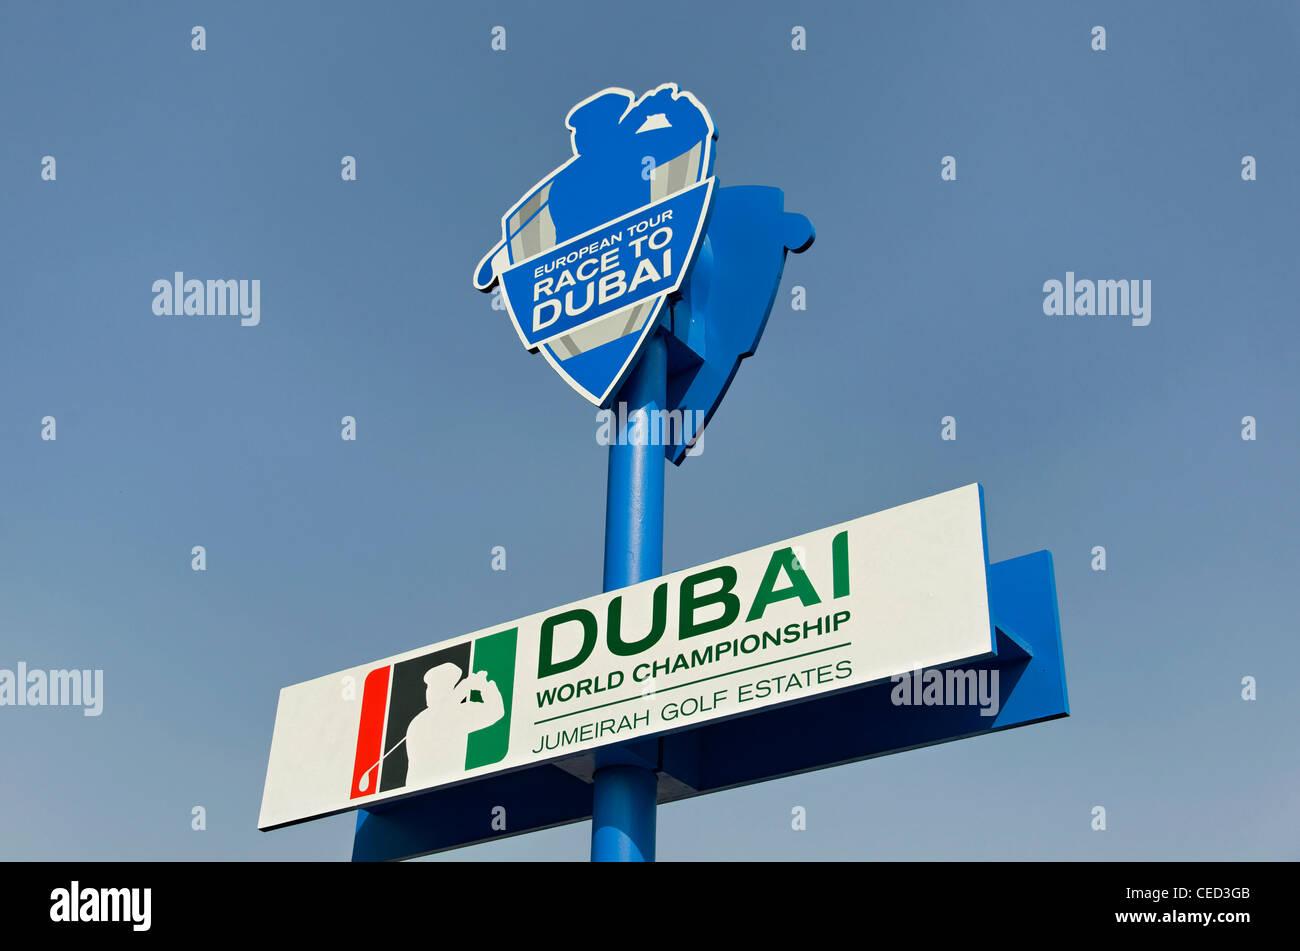 Logo of the European Tour, Race to Dubai, World Golf Championship Final, Jumeirah Golf Estates, Dubai, United Arab - Stock Image